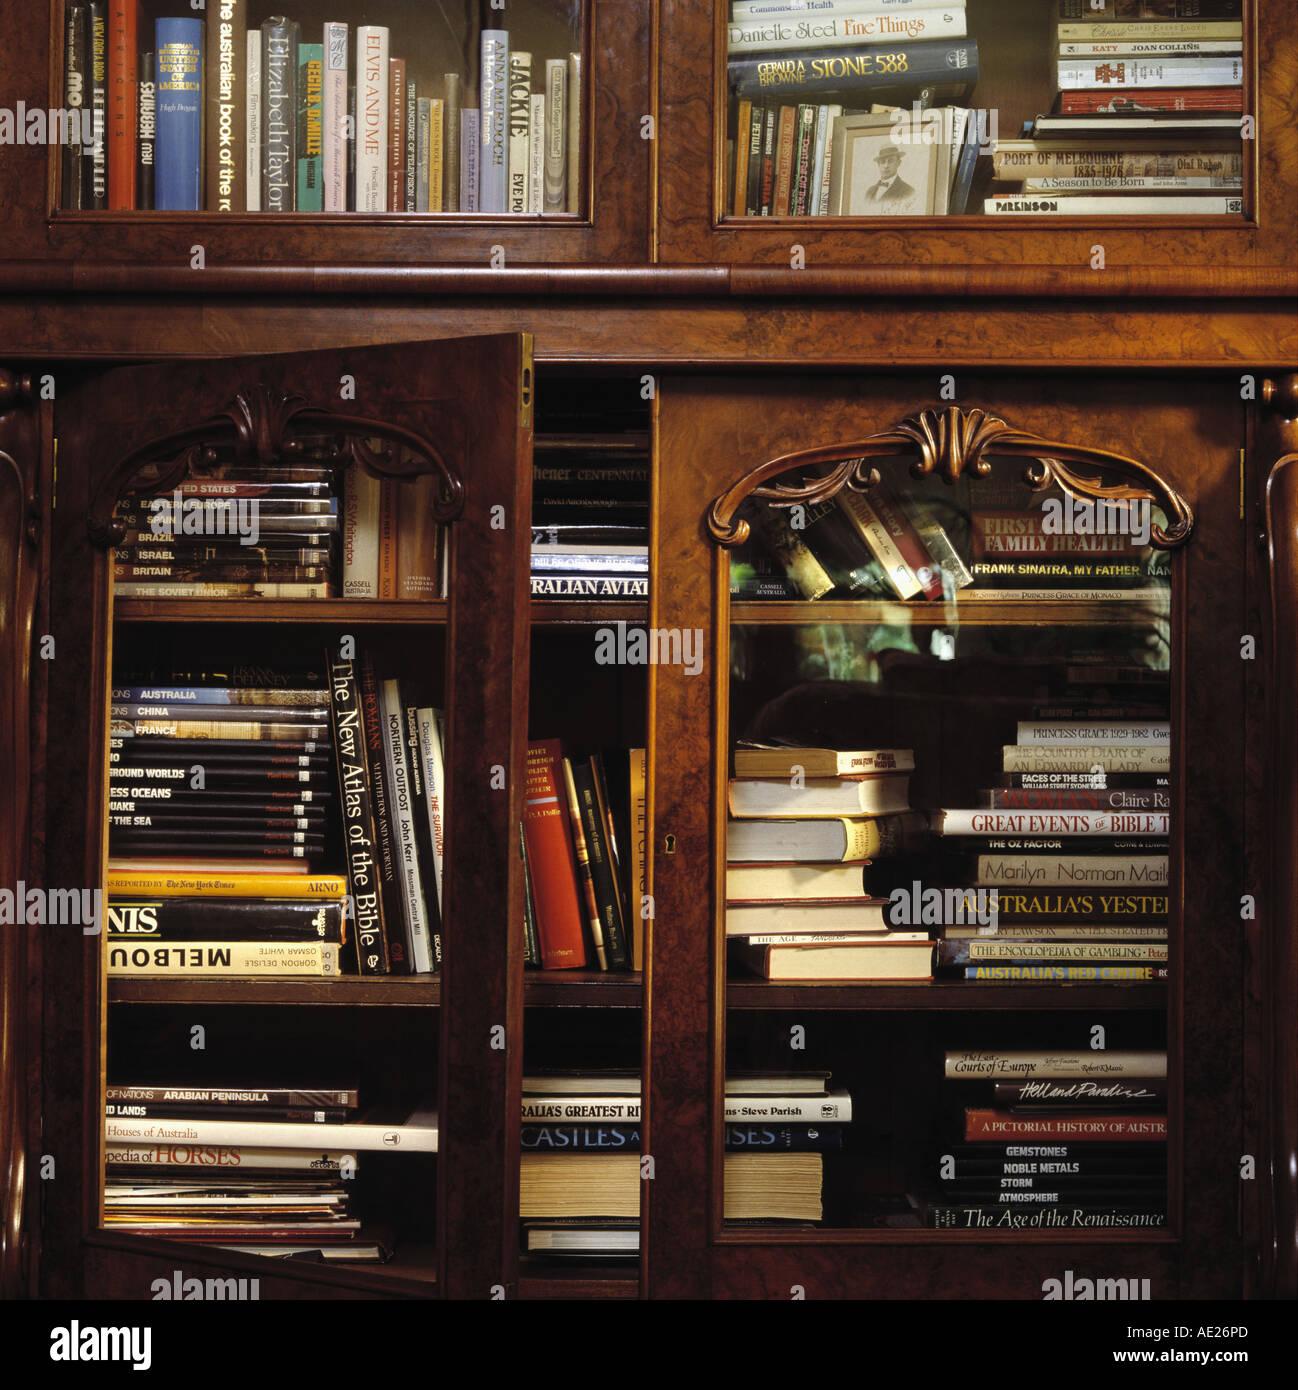 Nahaufnahme Von Buchern In Antik Mahagoni Bucherregal Mit Glasturen Stockfotografie Alamy